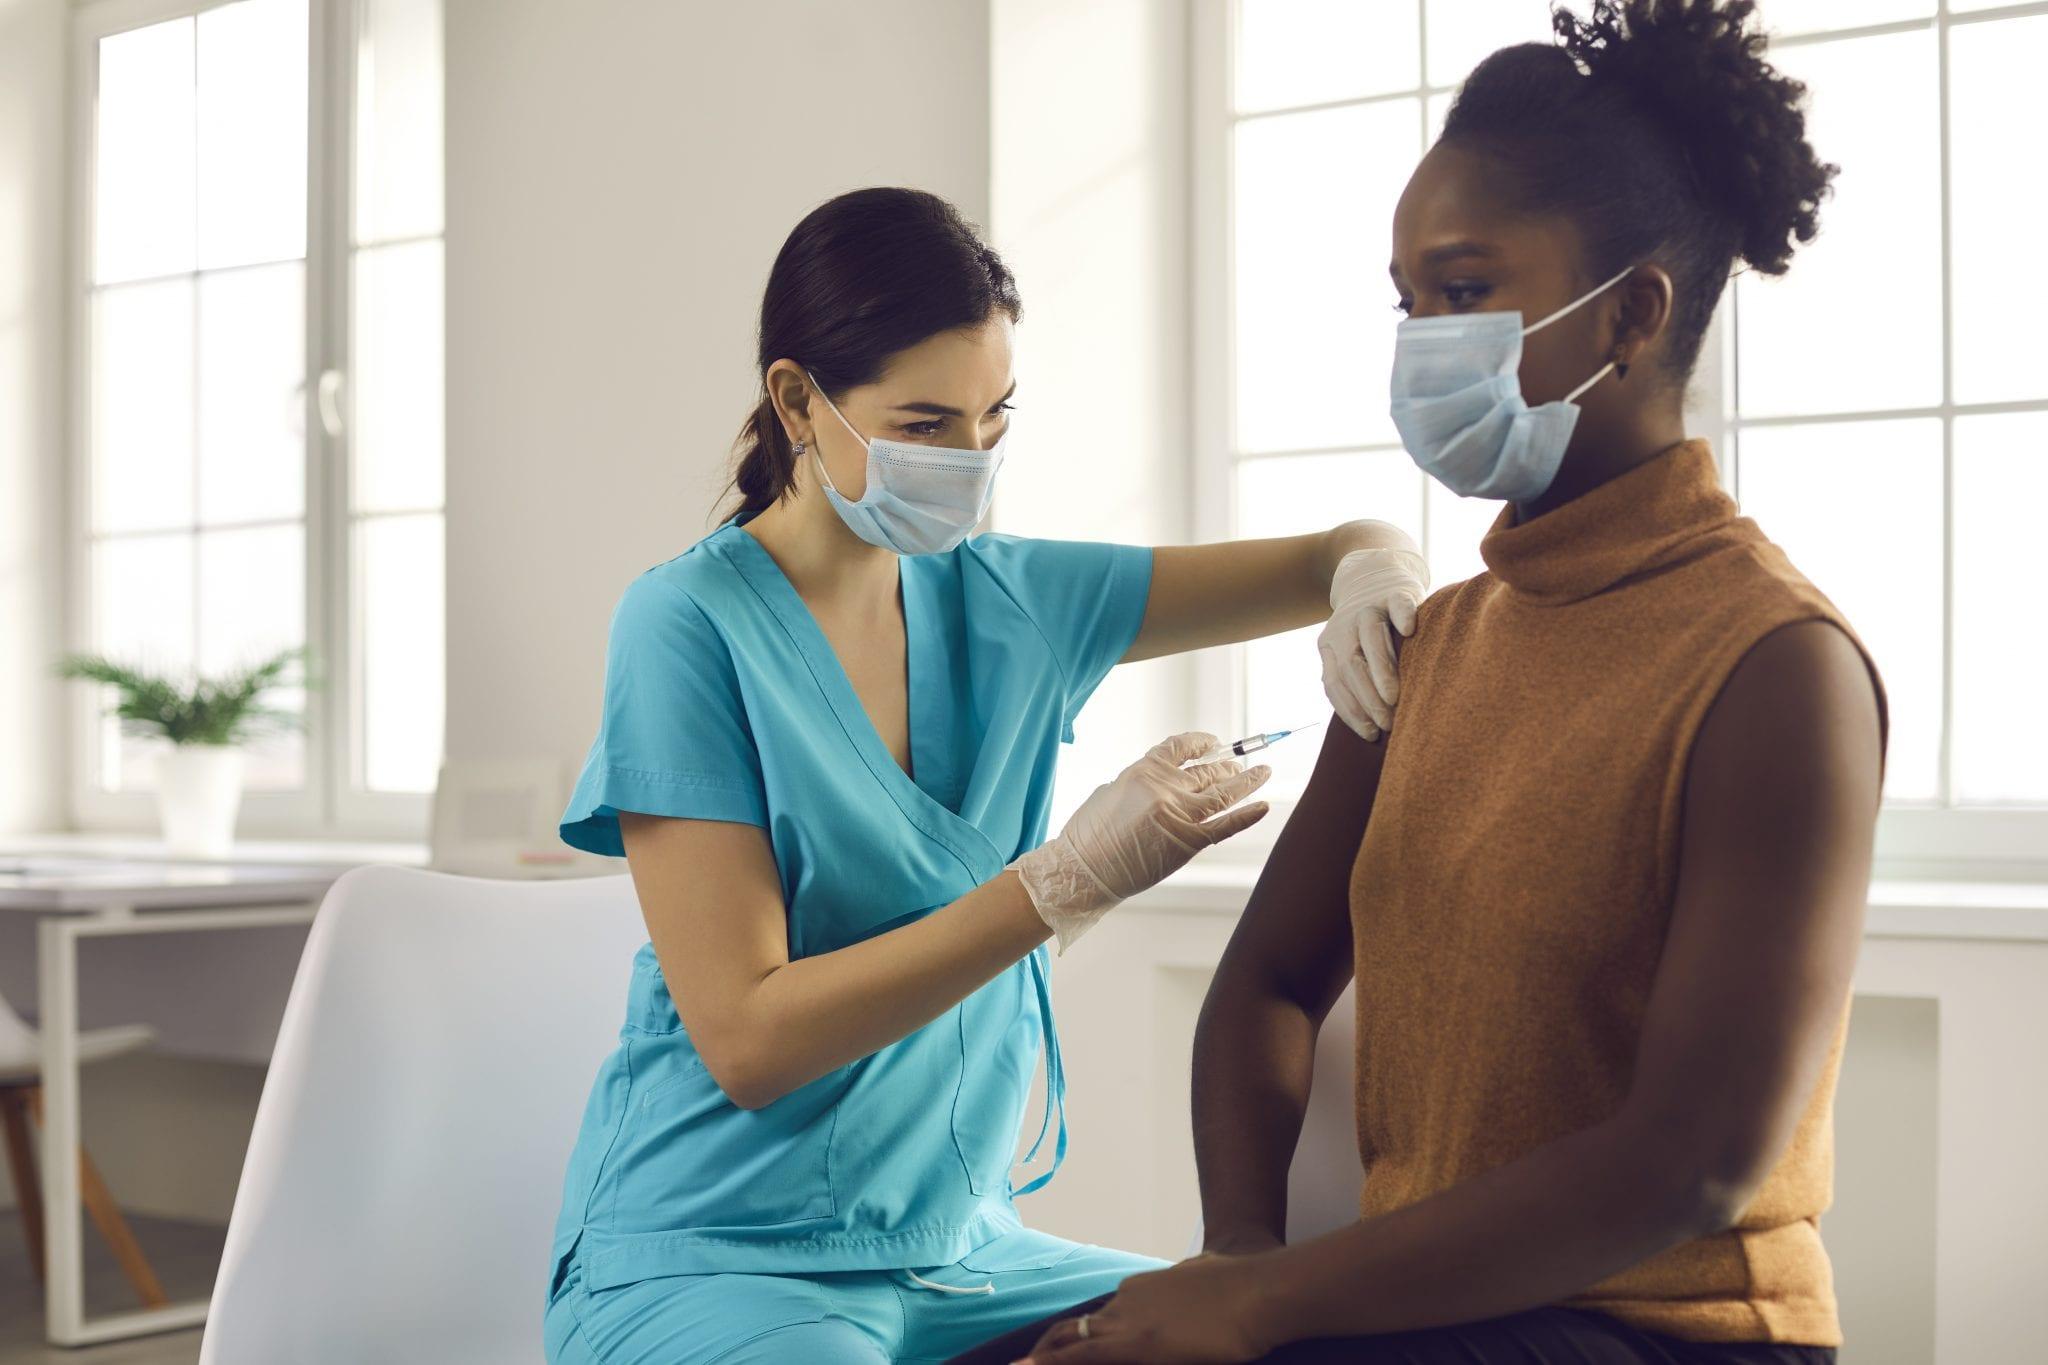 INOVA Hospital has vaccinated over 300,000 people already. (Photo: Adobe Stock, licensed to The Zebra Press)